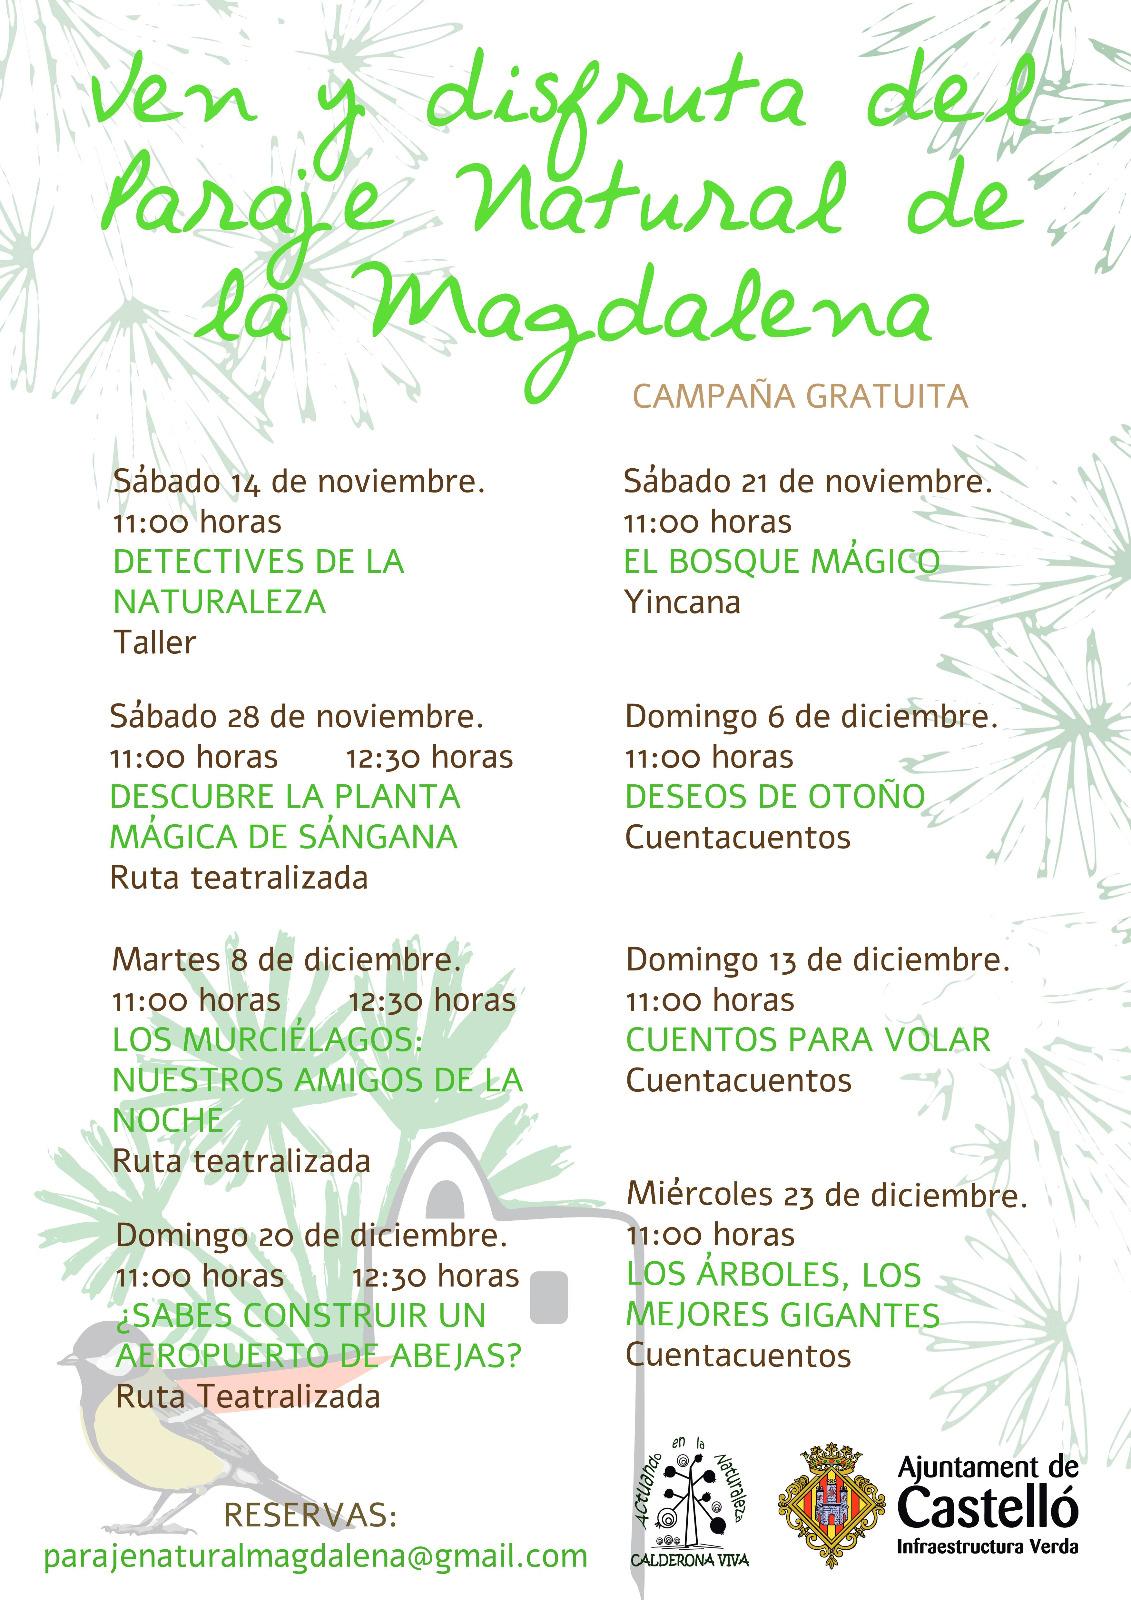 Actividades en el Parque Natural de la Magdalena